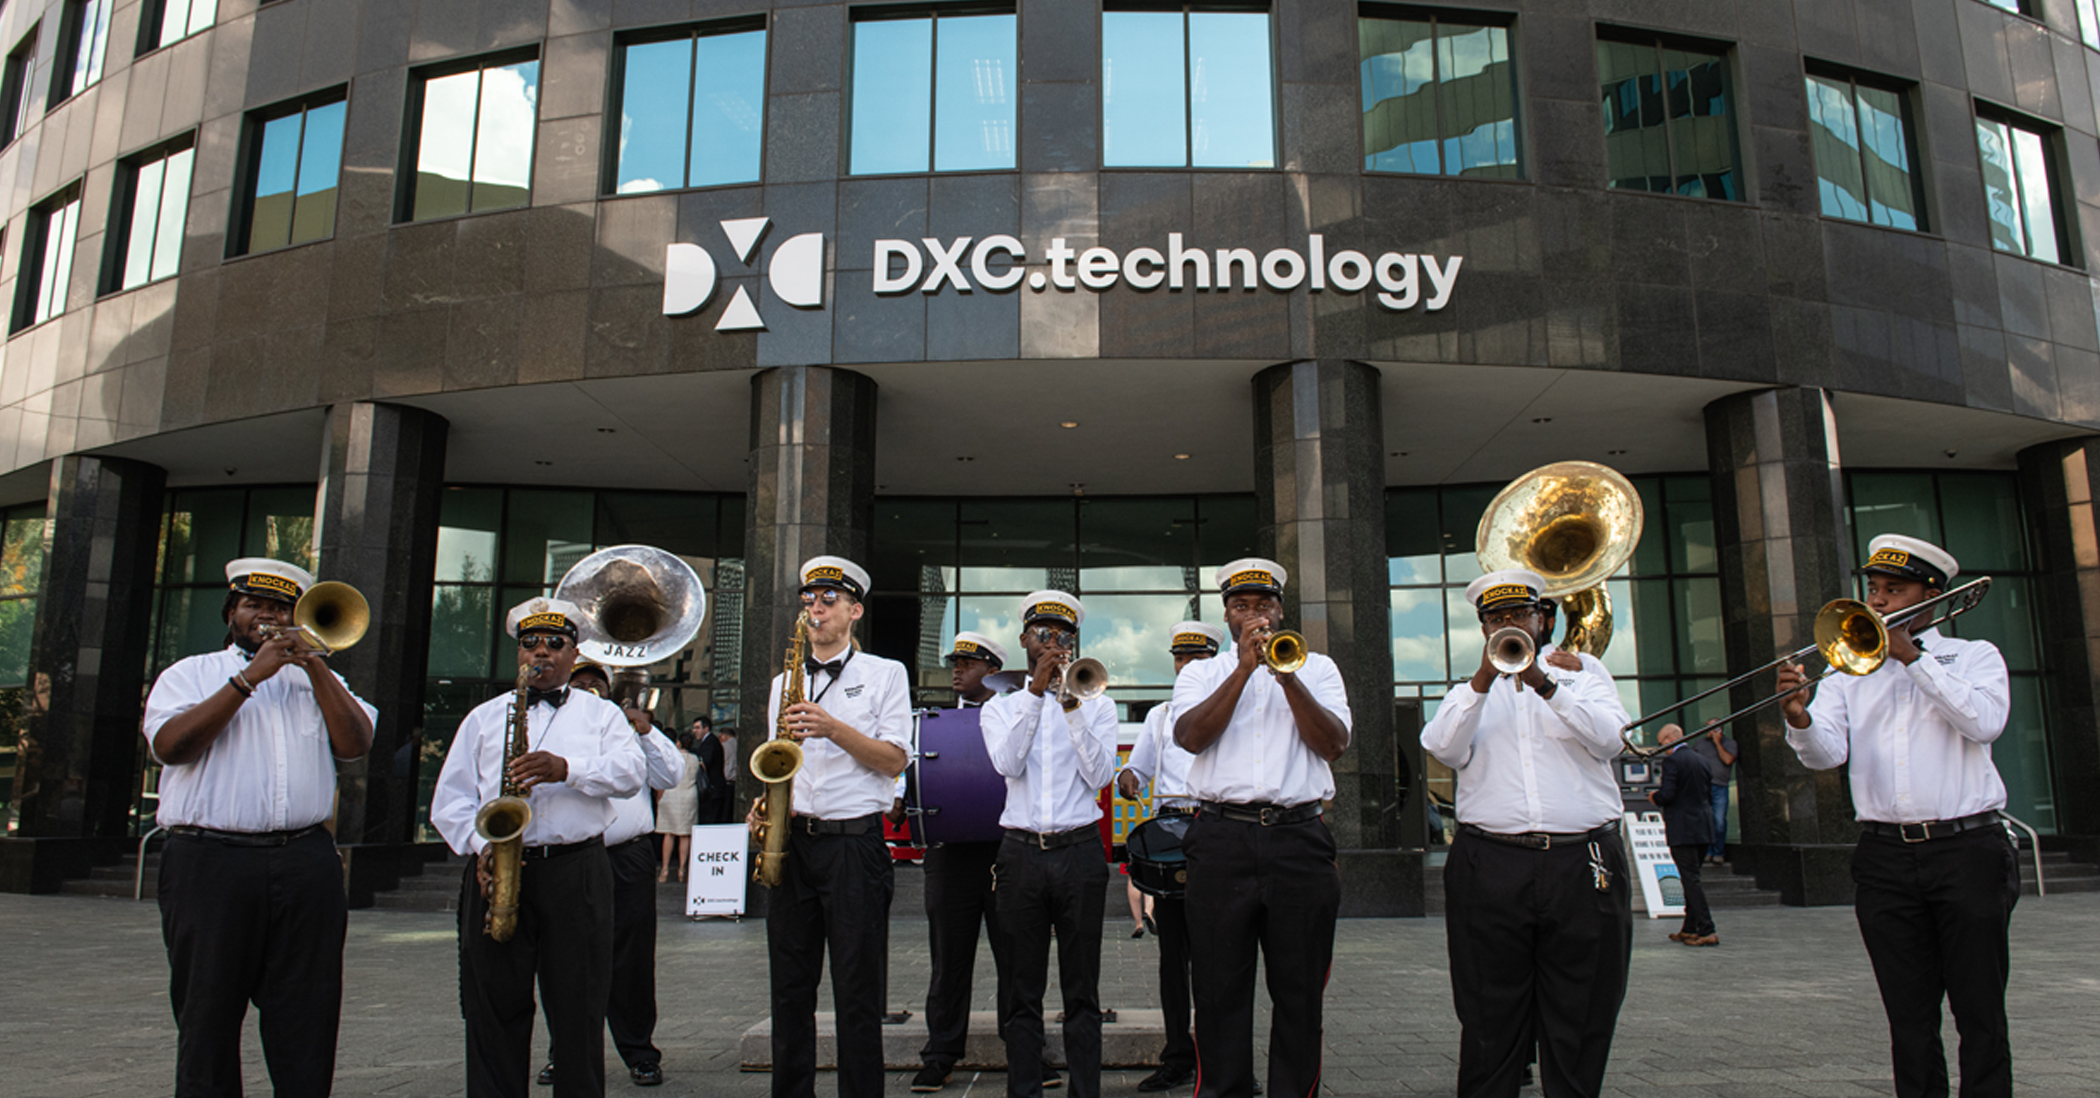 Jazz band playing music outside of DXC technology